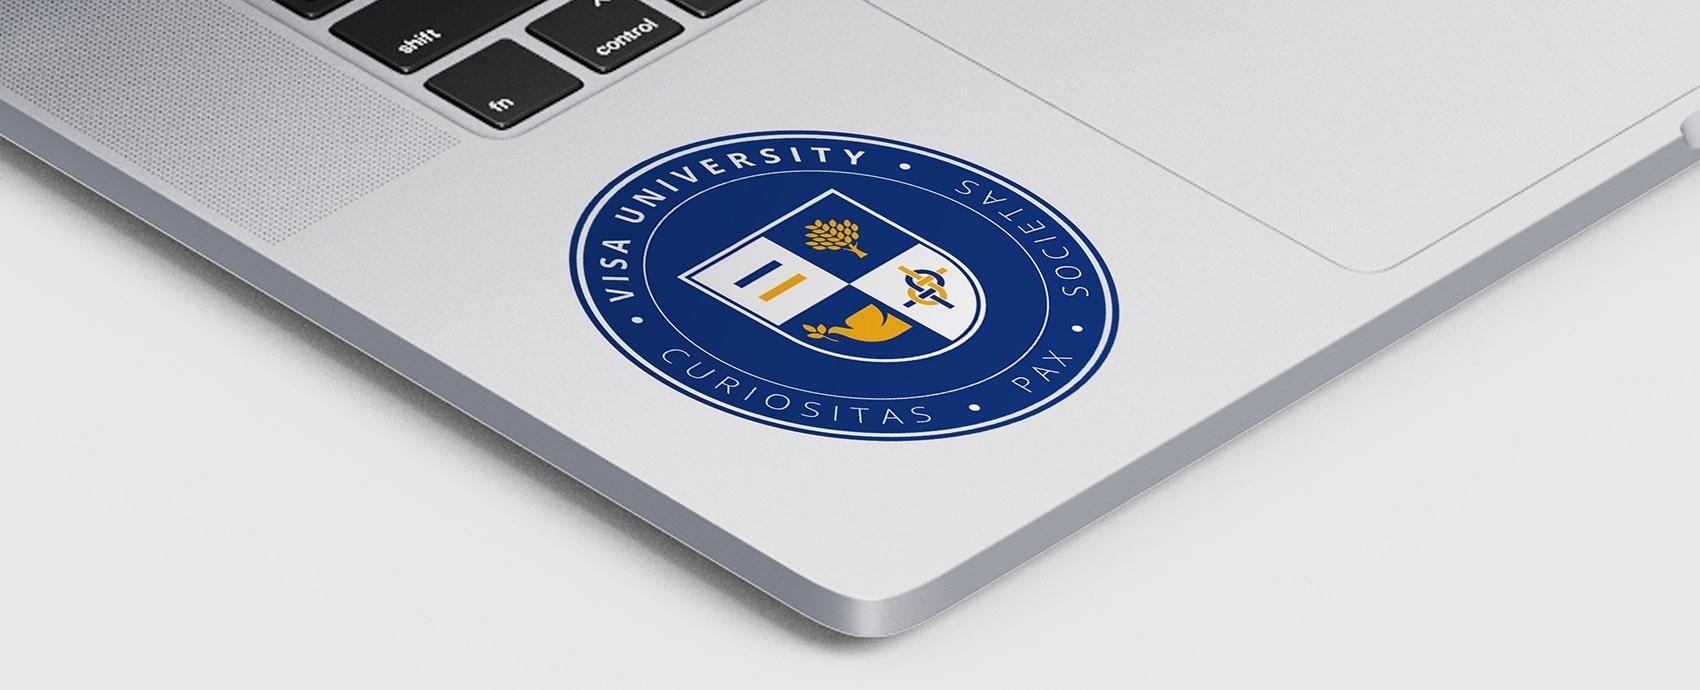 Visa University Brand